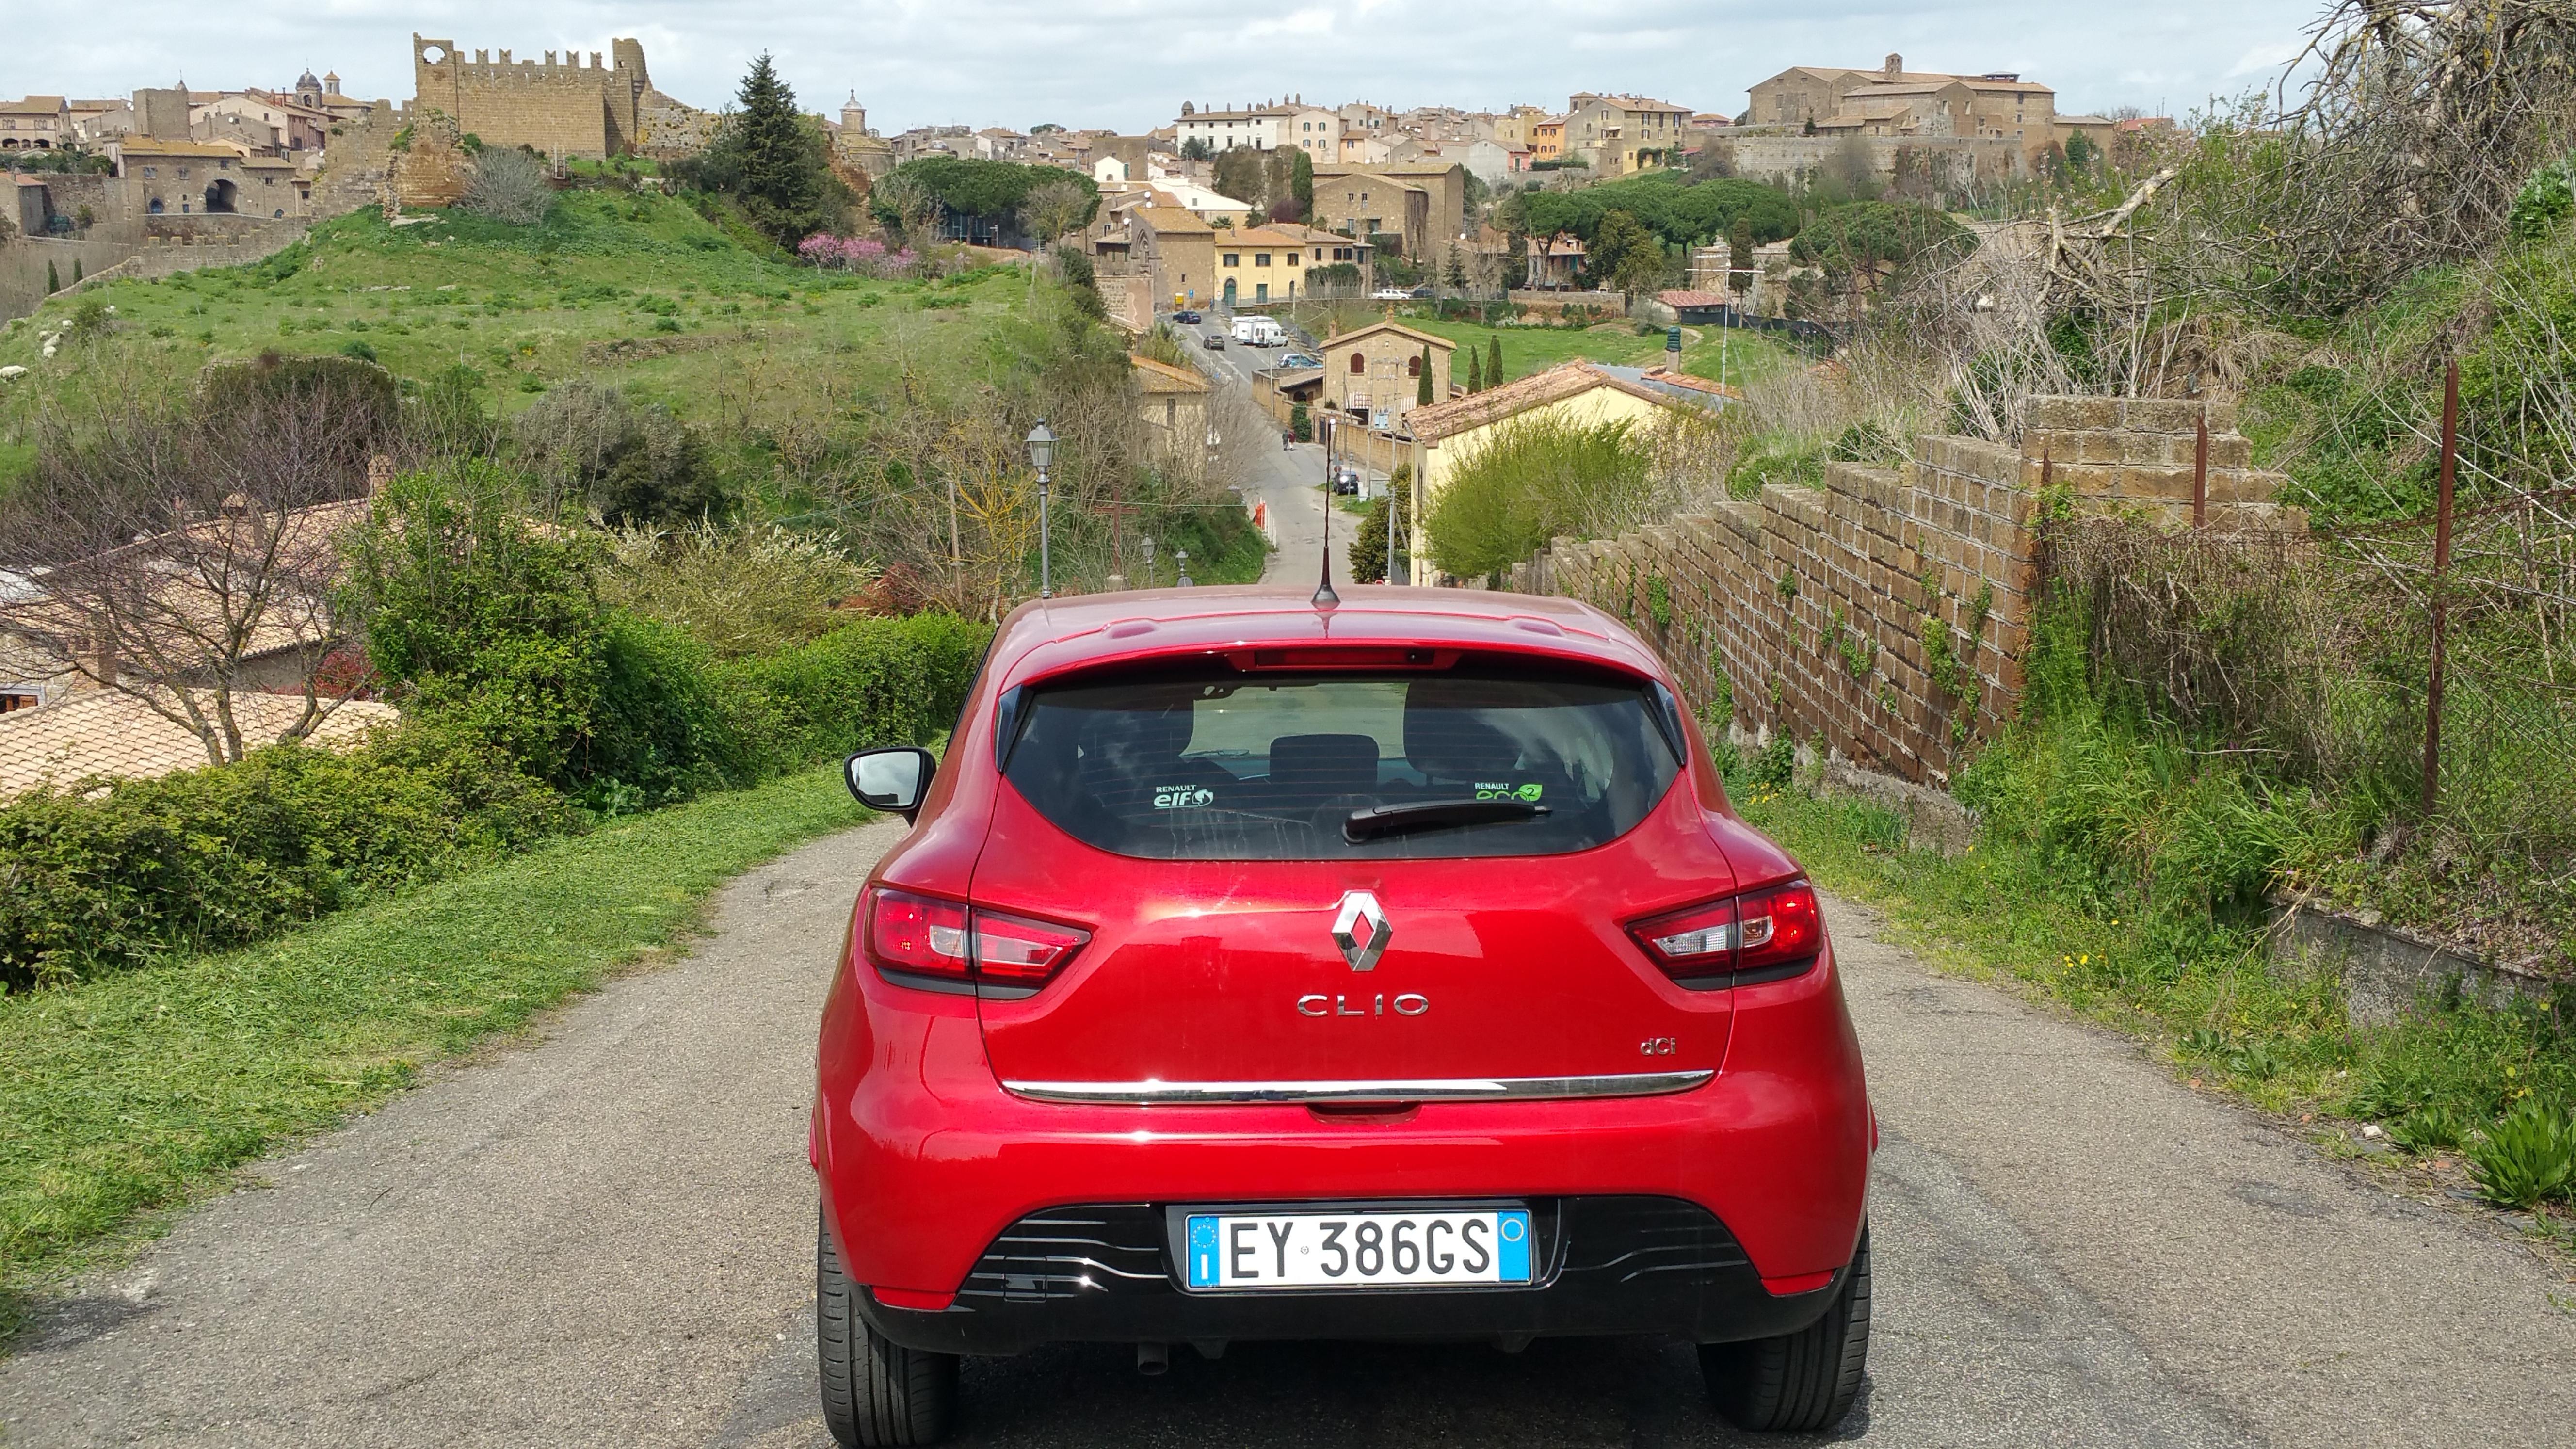 Schemi Elettrici Renault : Sistema elettronico renault clio iv notiziario motoristico